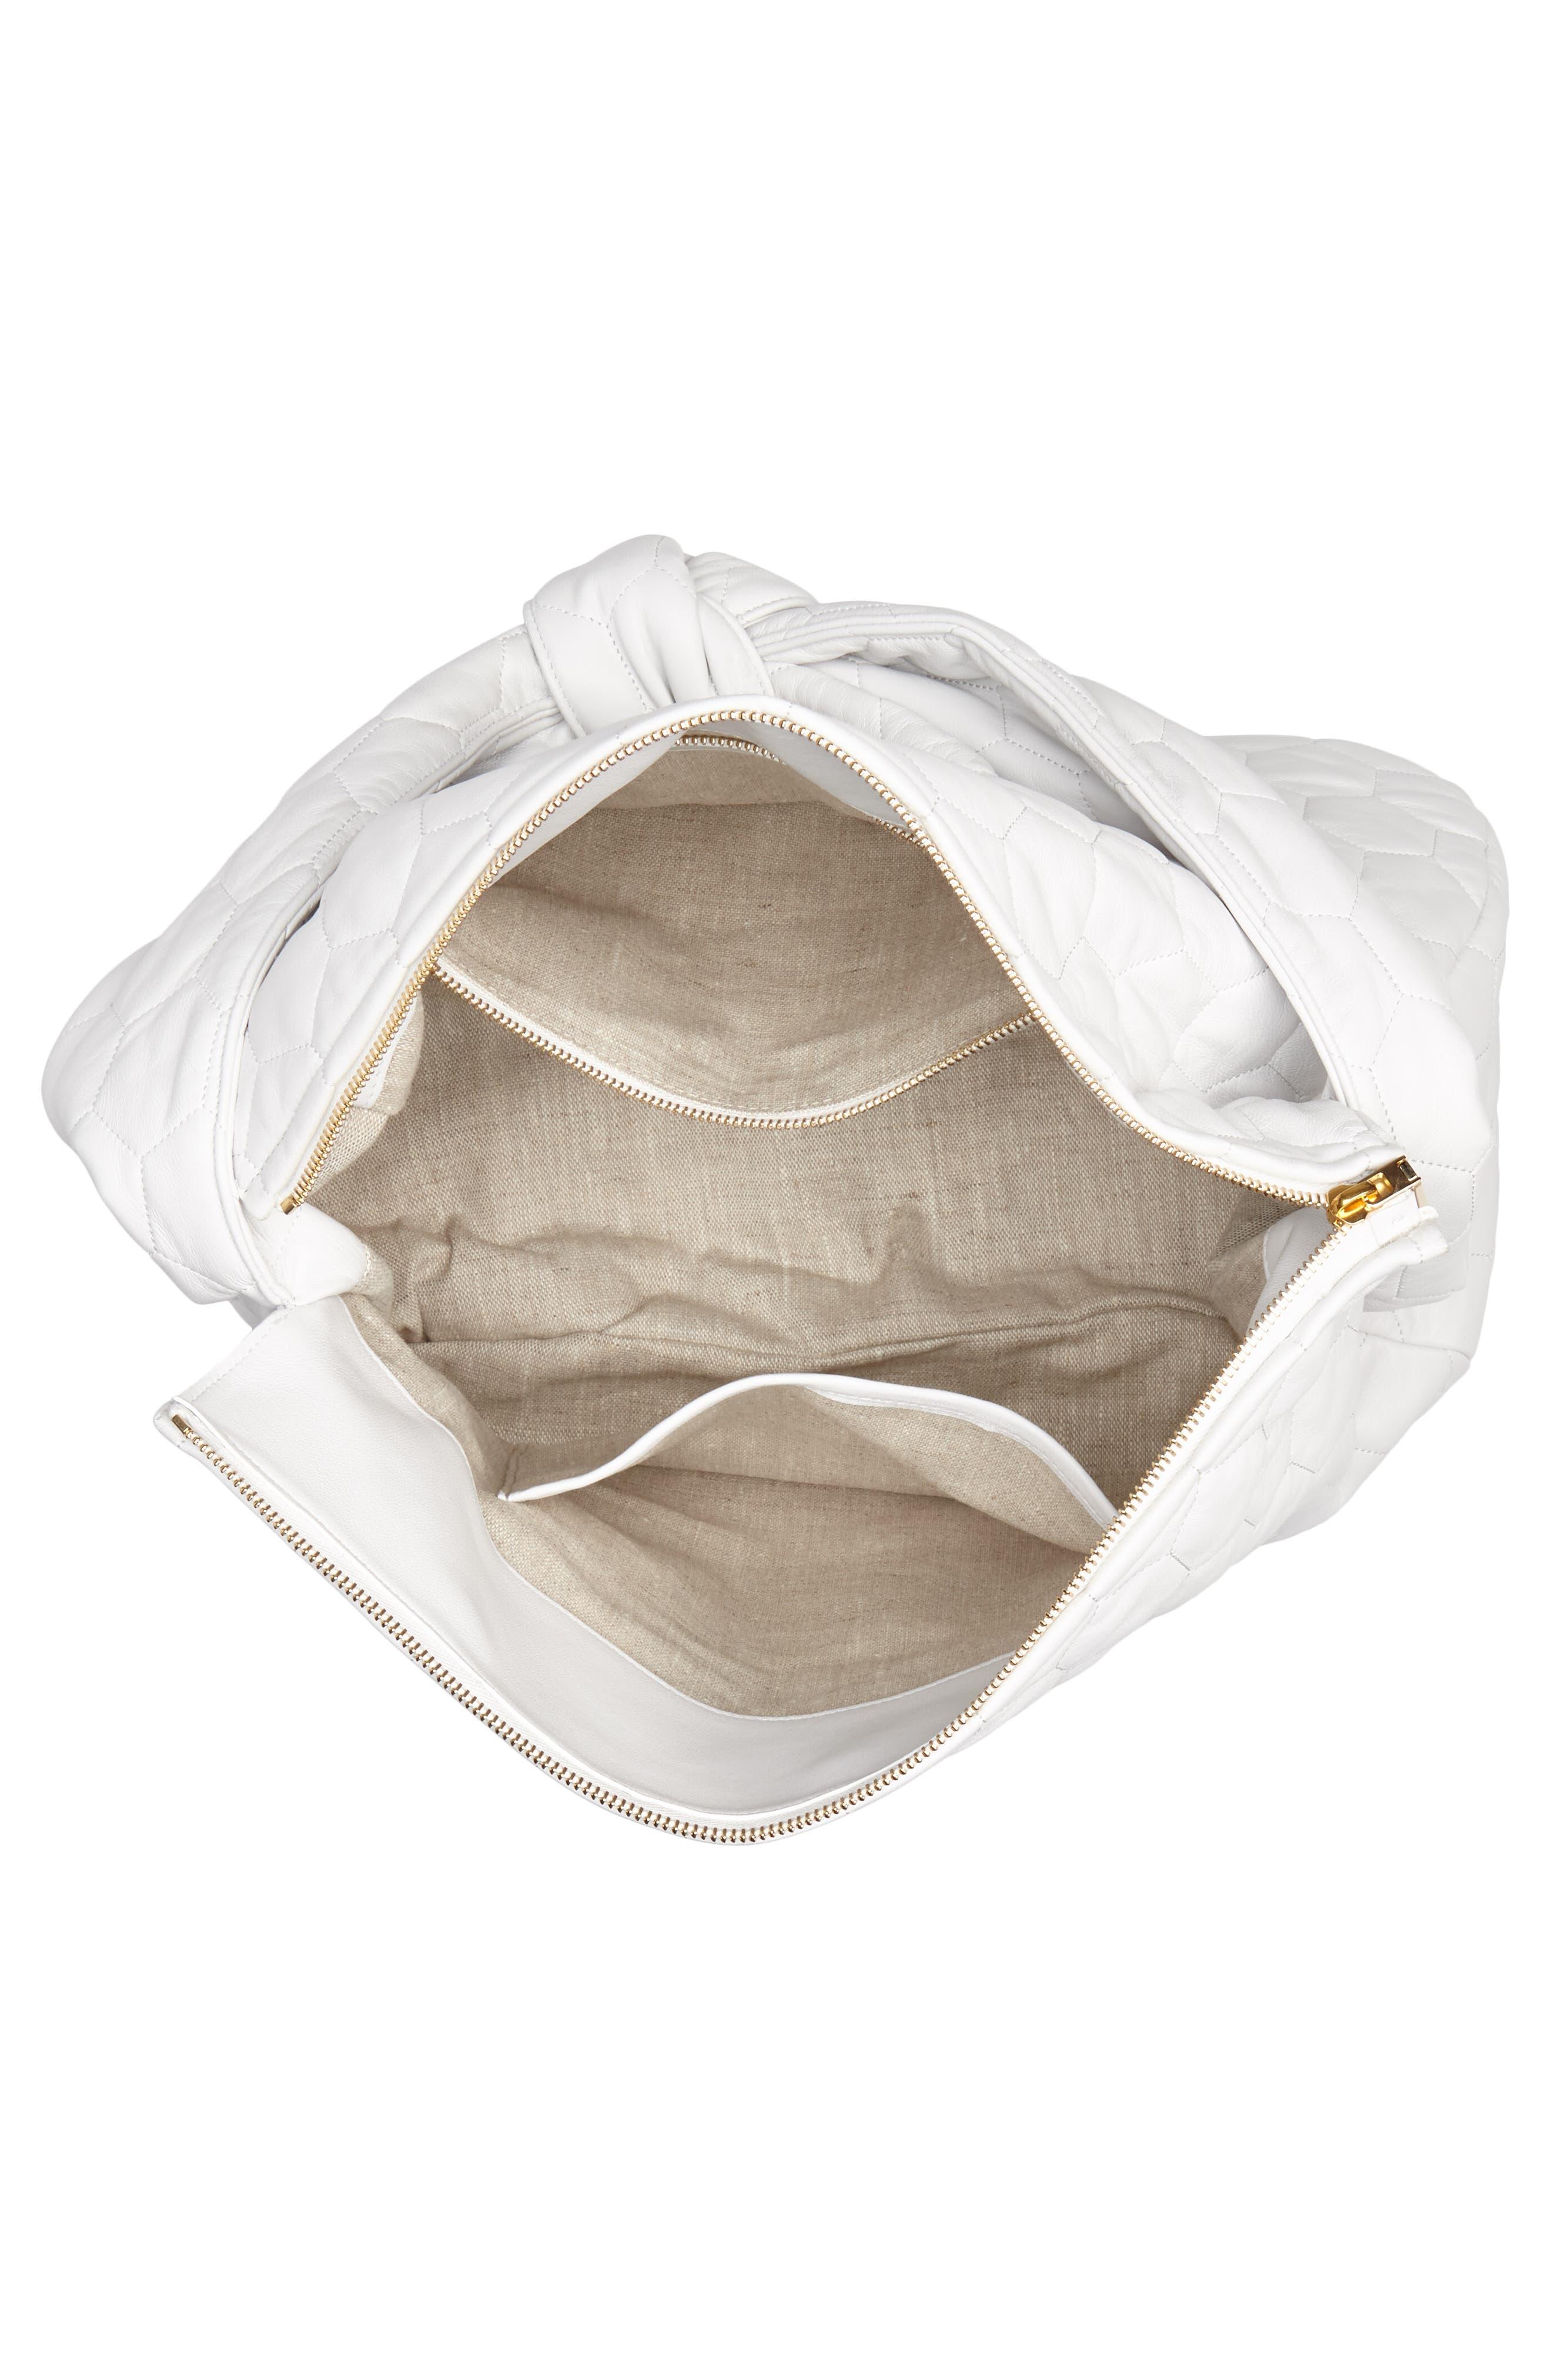 Balloon Leather Shoulder Bag,                             Alternate thumbnail 4, color,